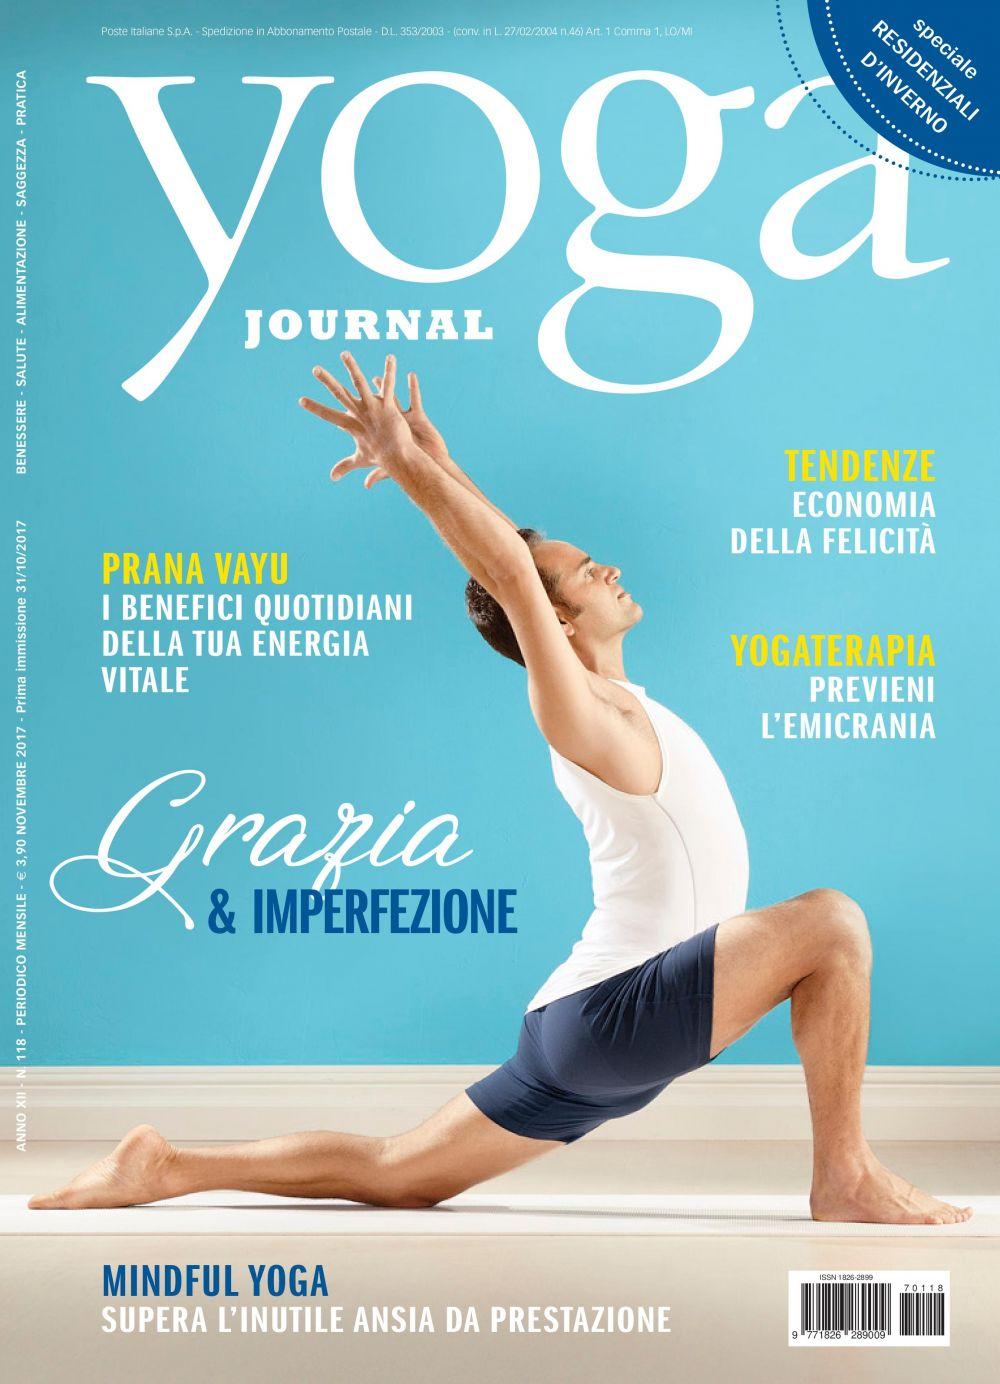 Yoga Journal Novembre n. 118